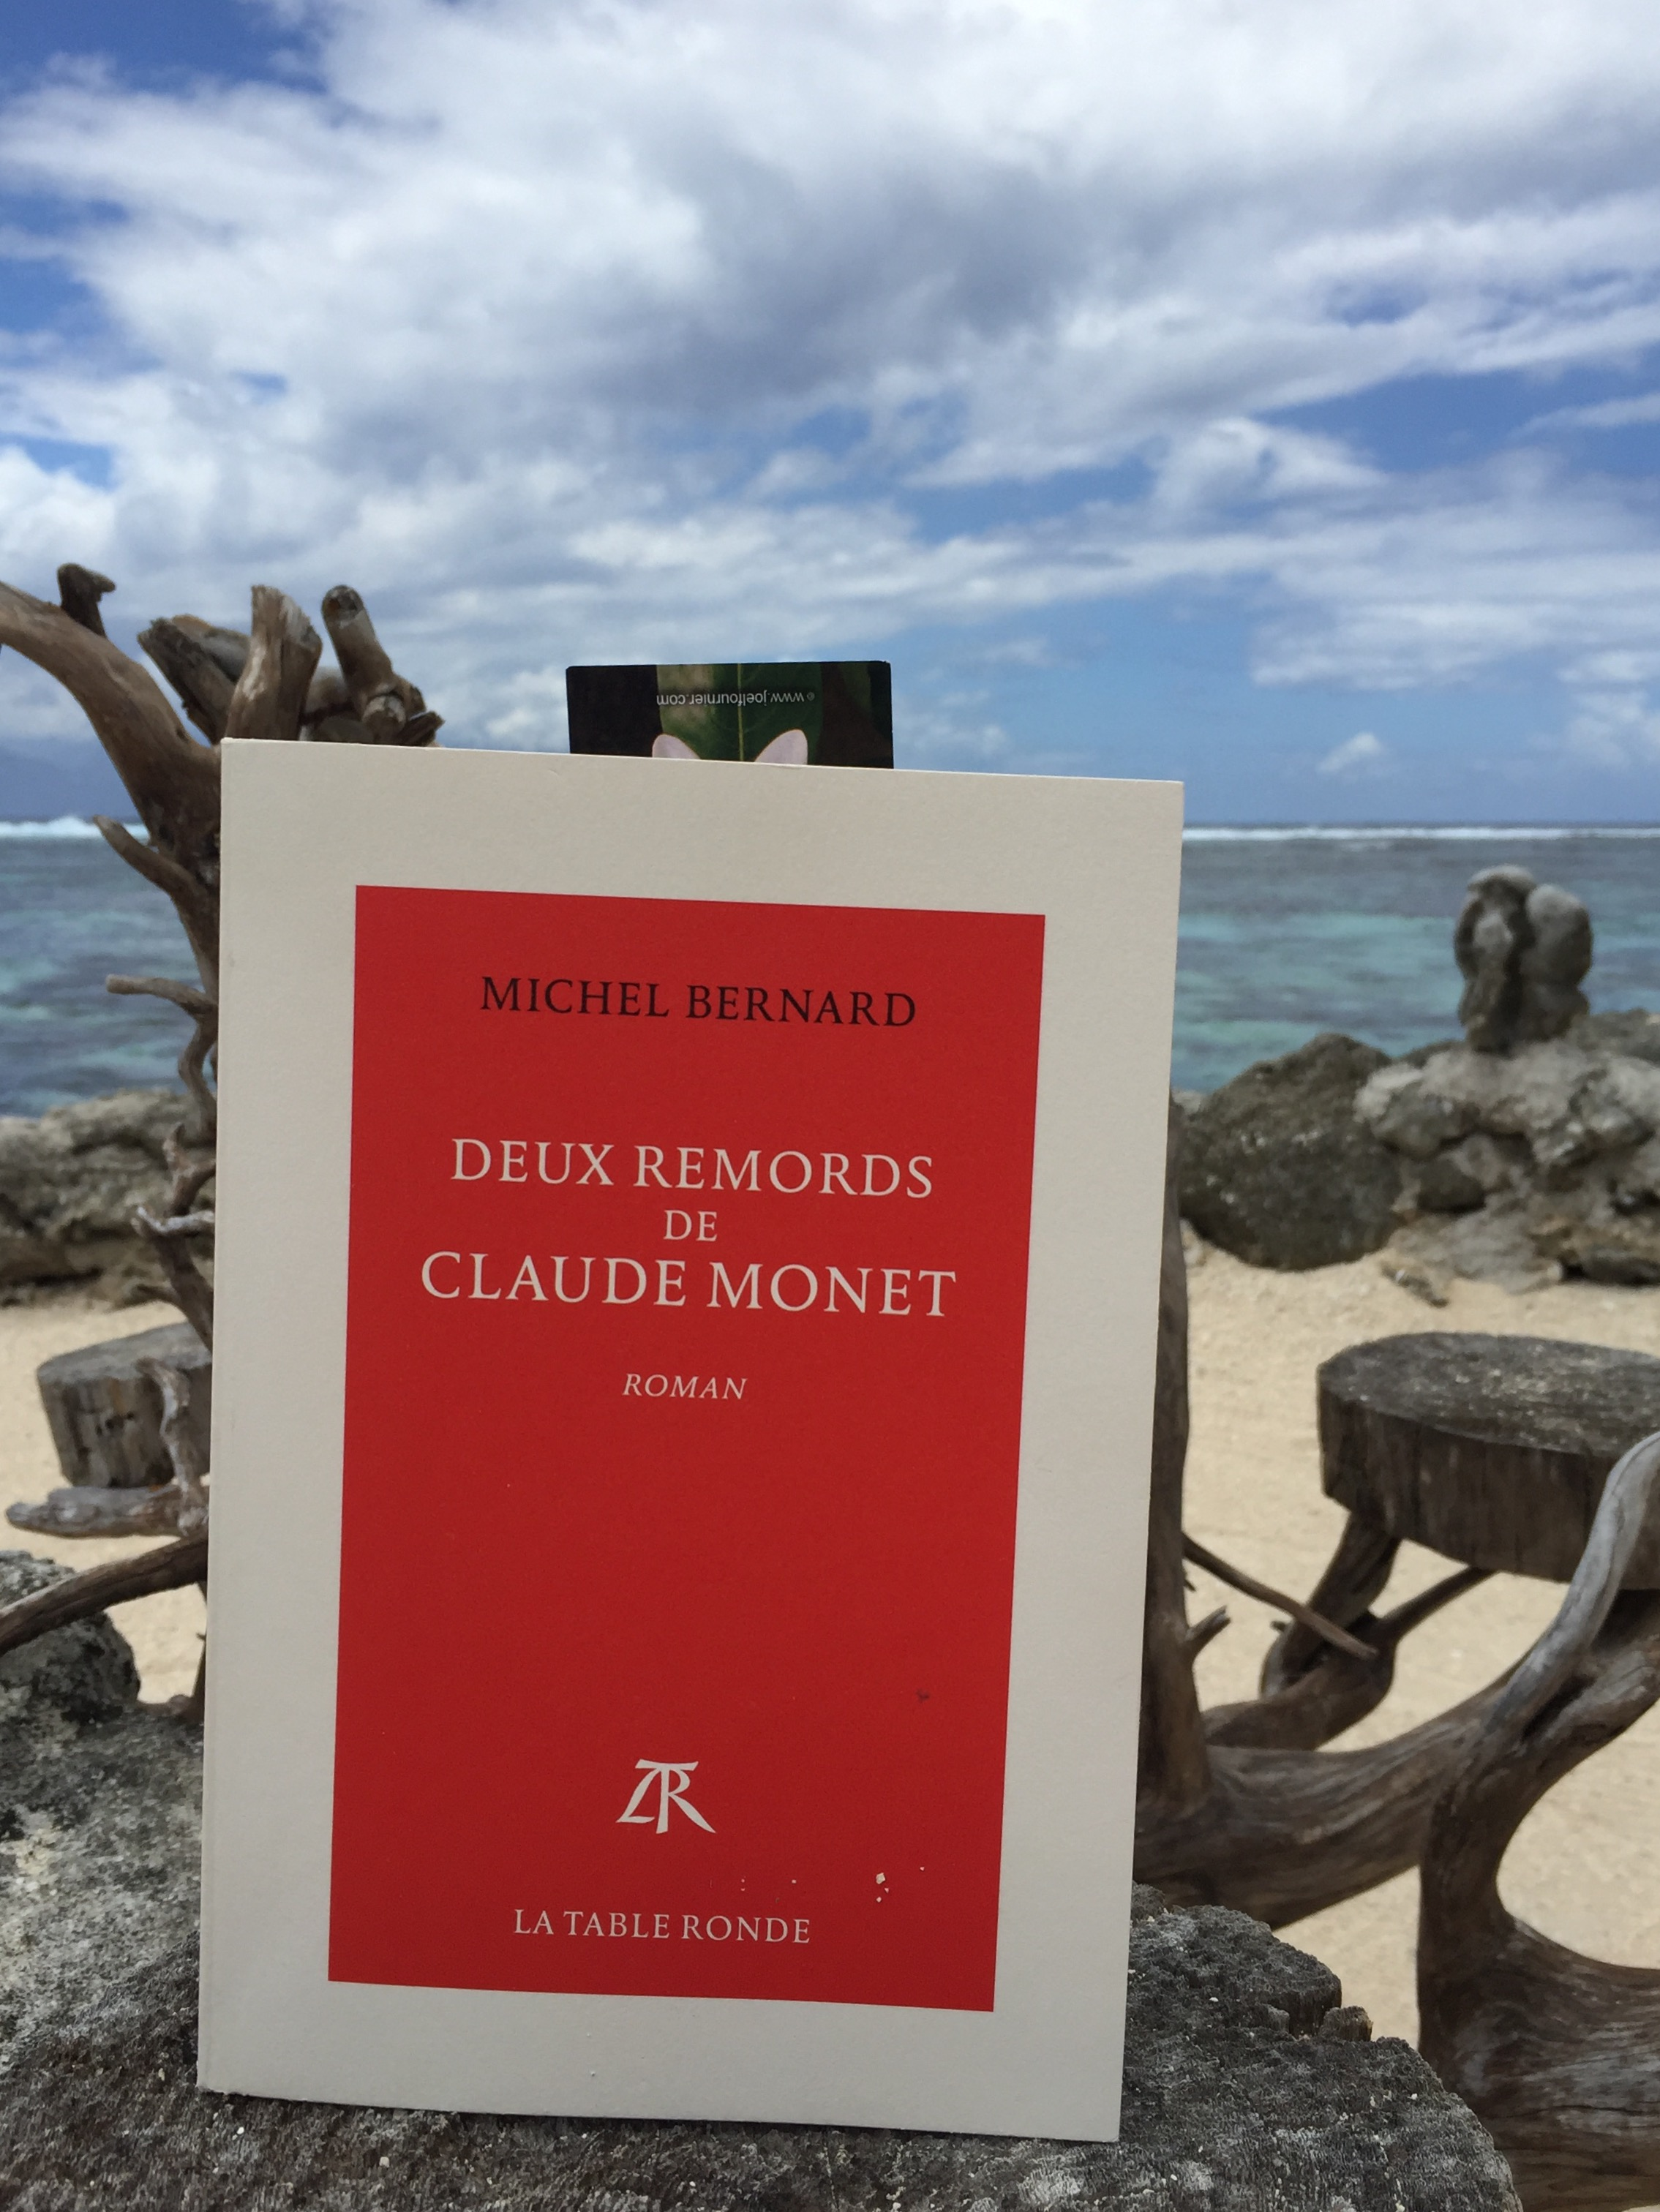 Michel Bernard : Les deux remords de Claude Monet